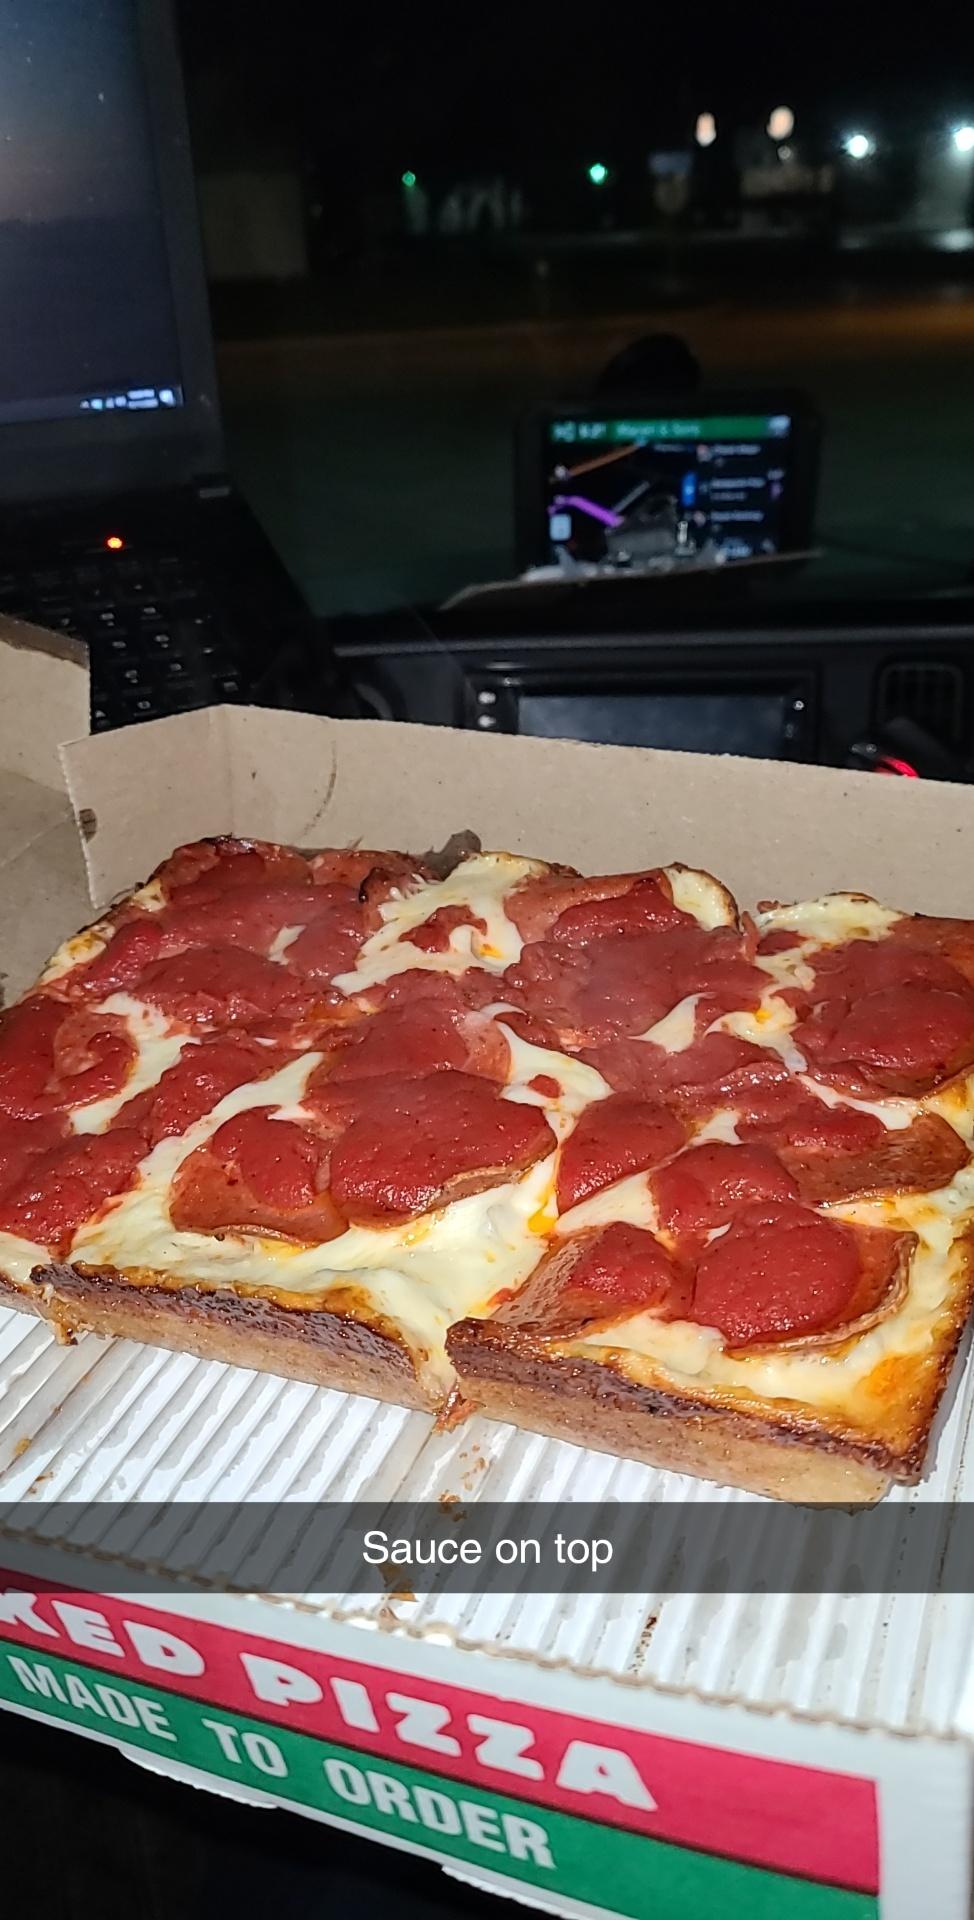 matt.fumich on One Bite Pizza App